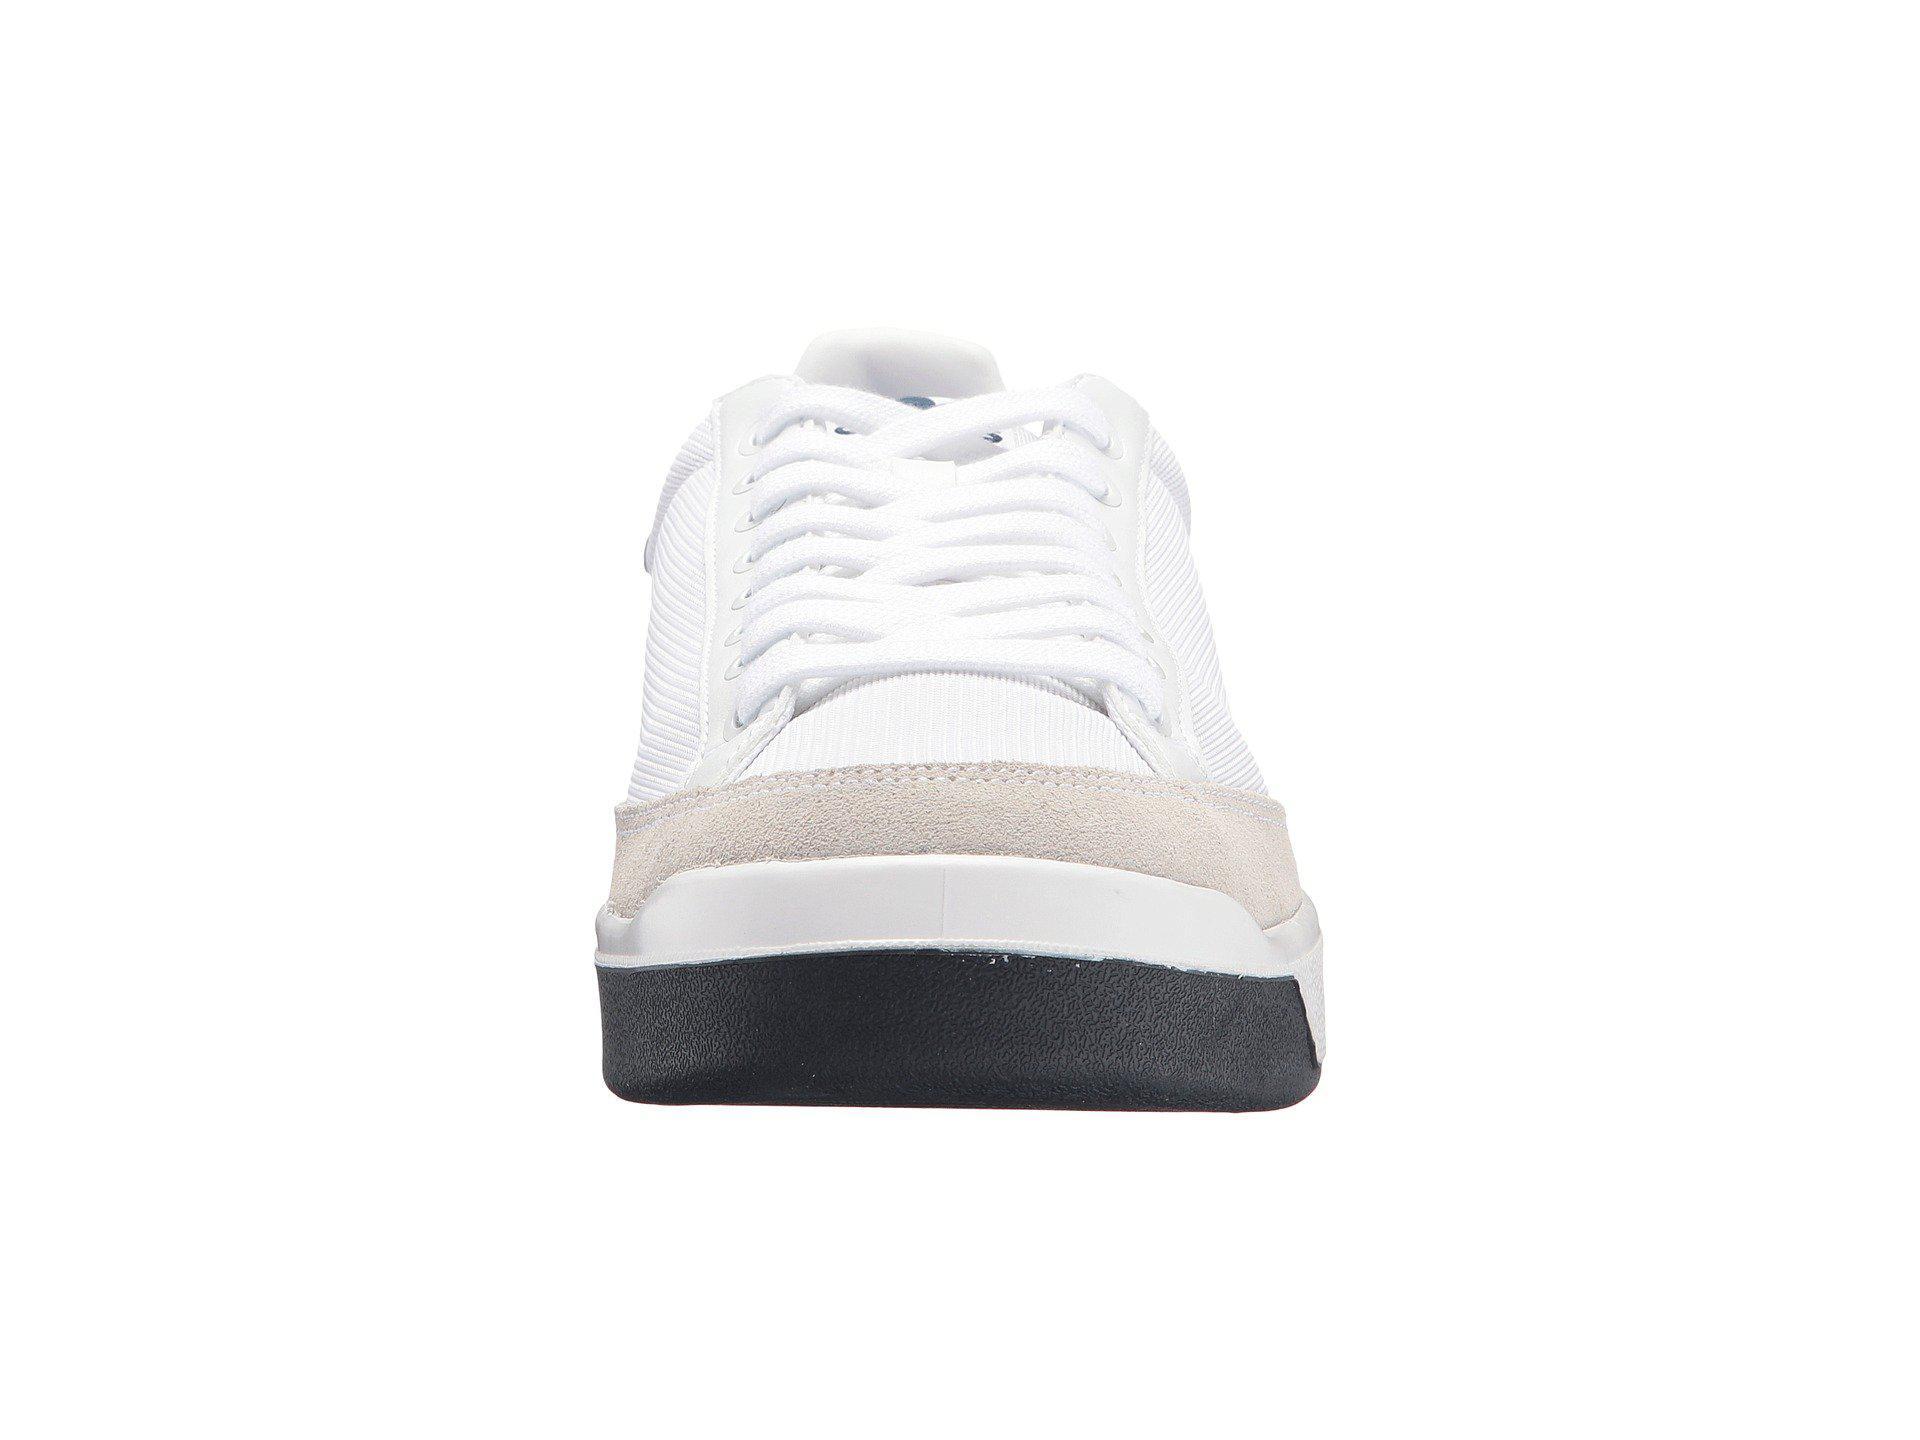 4b872061d adidas Originals Rod Laver Super (footwear White/footwear White ...